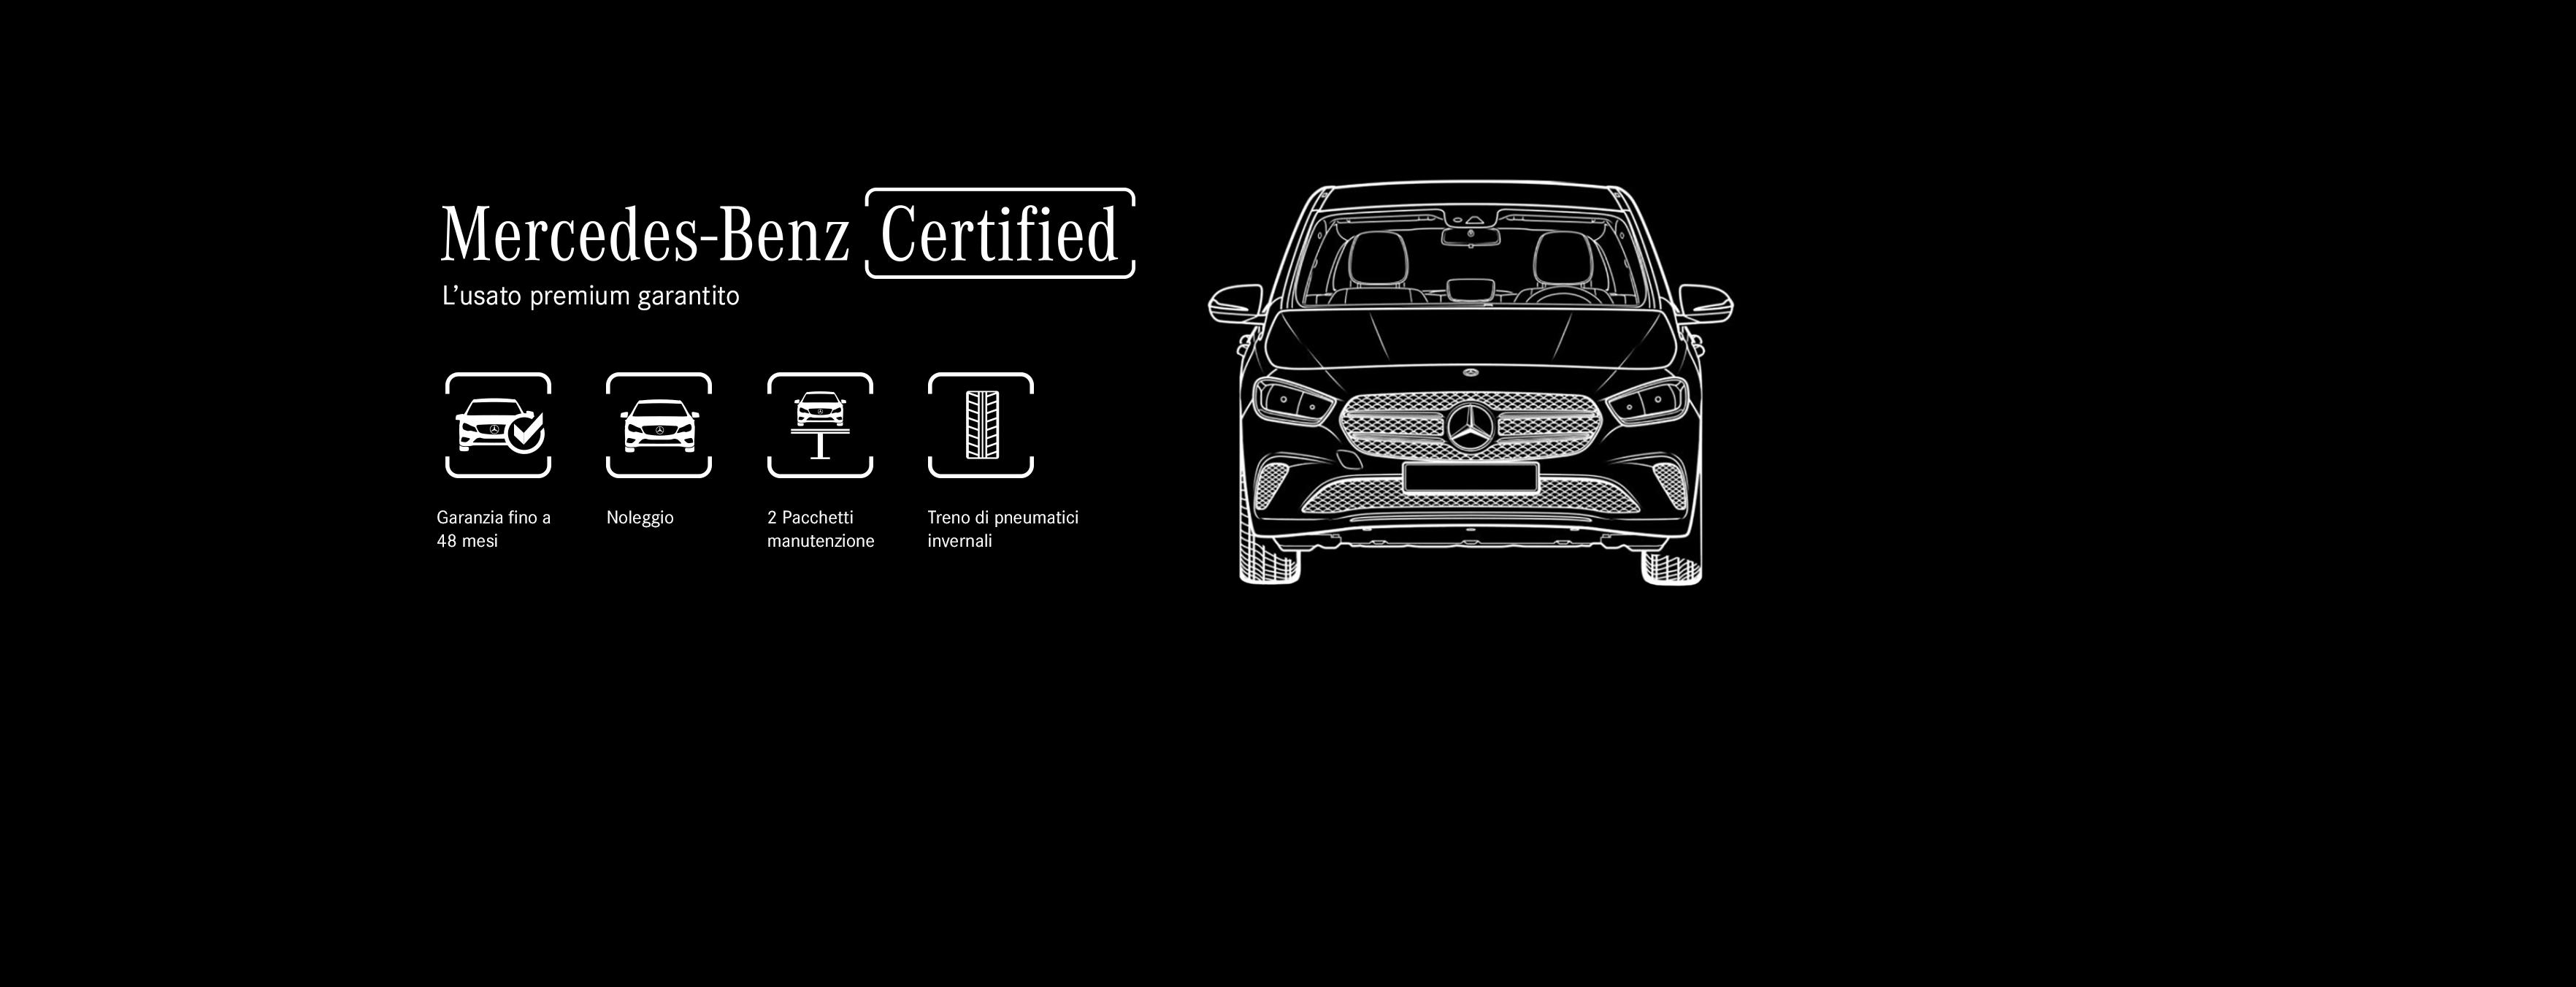 Rossi Certified